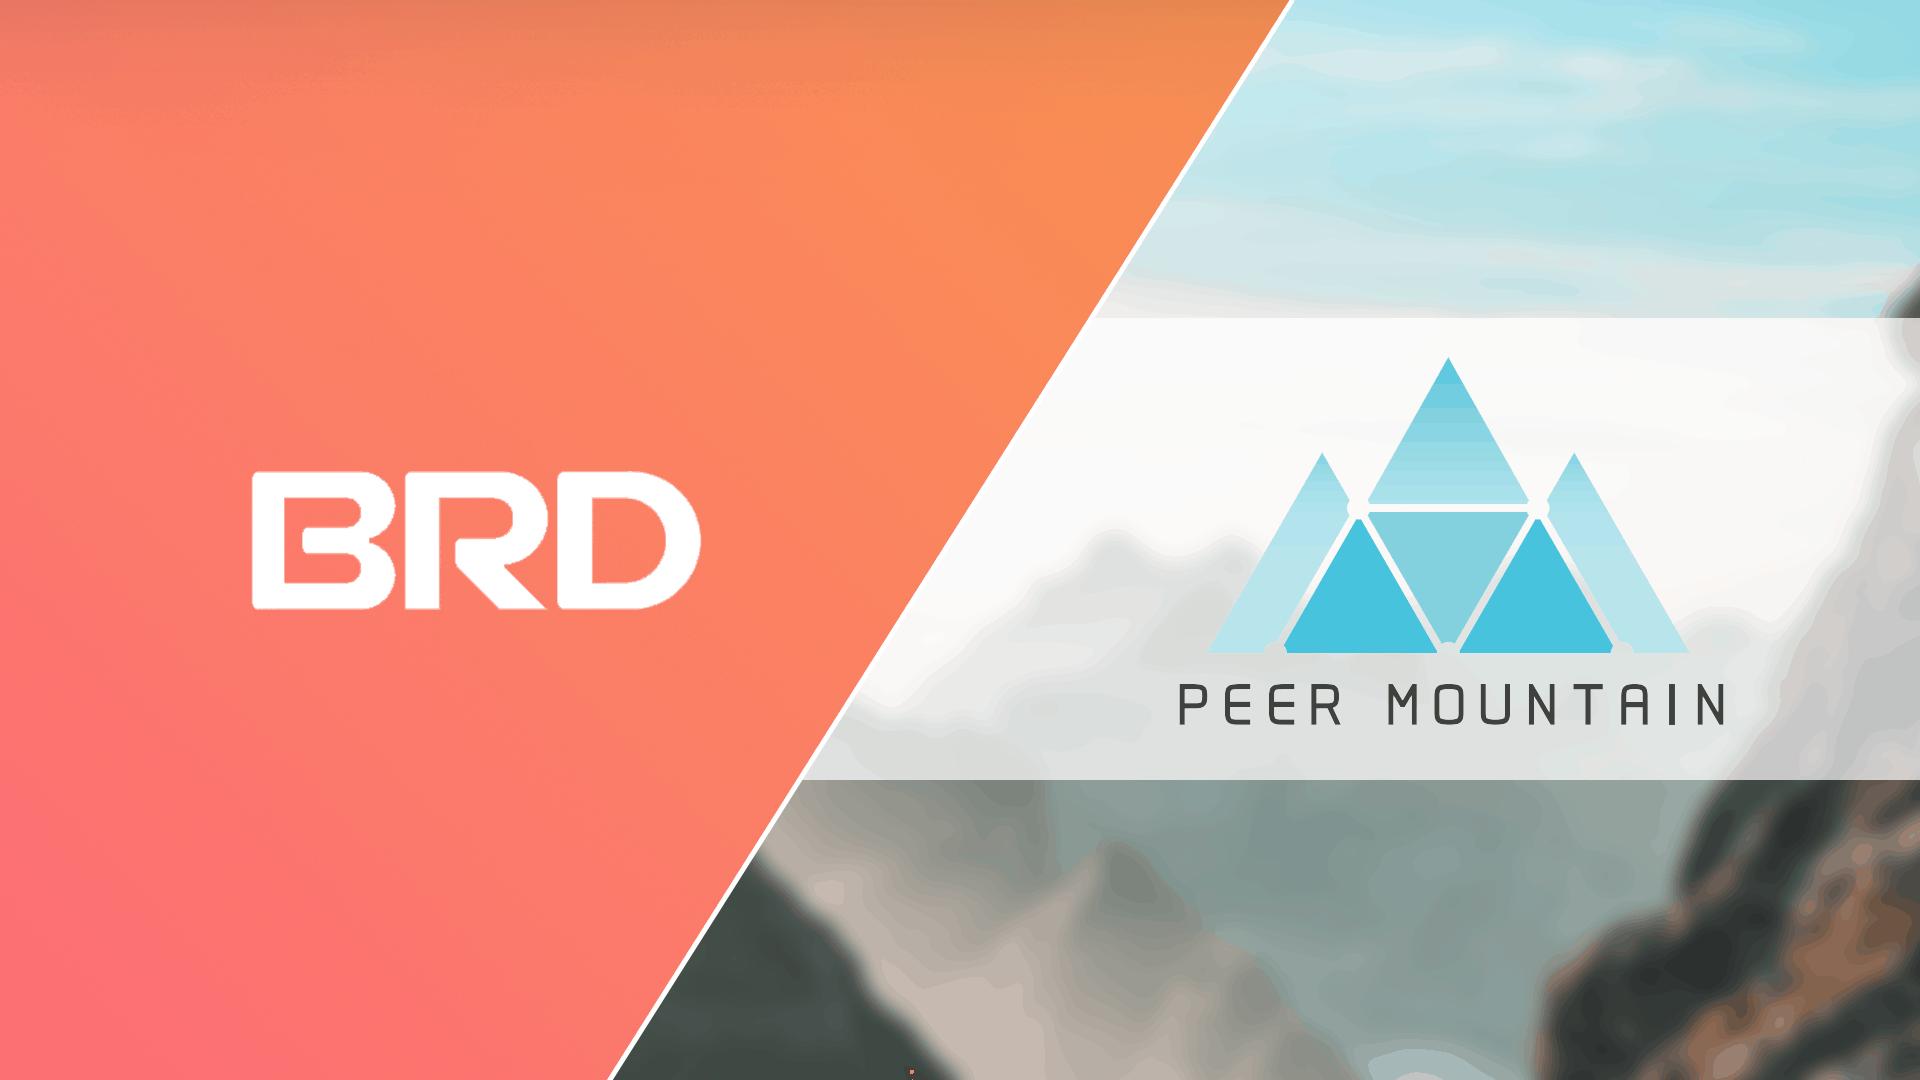 Partnership with peer mountain